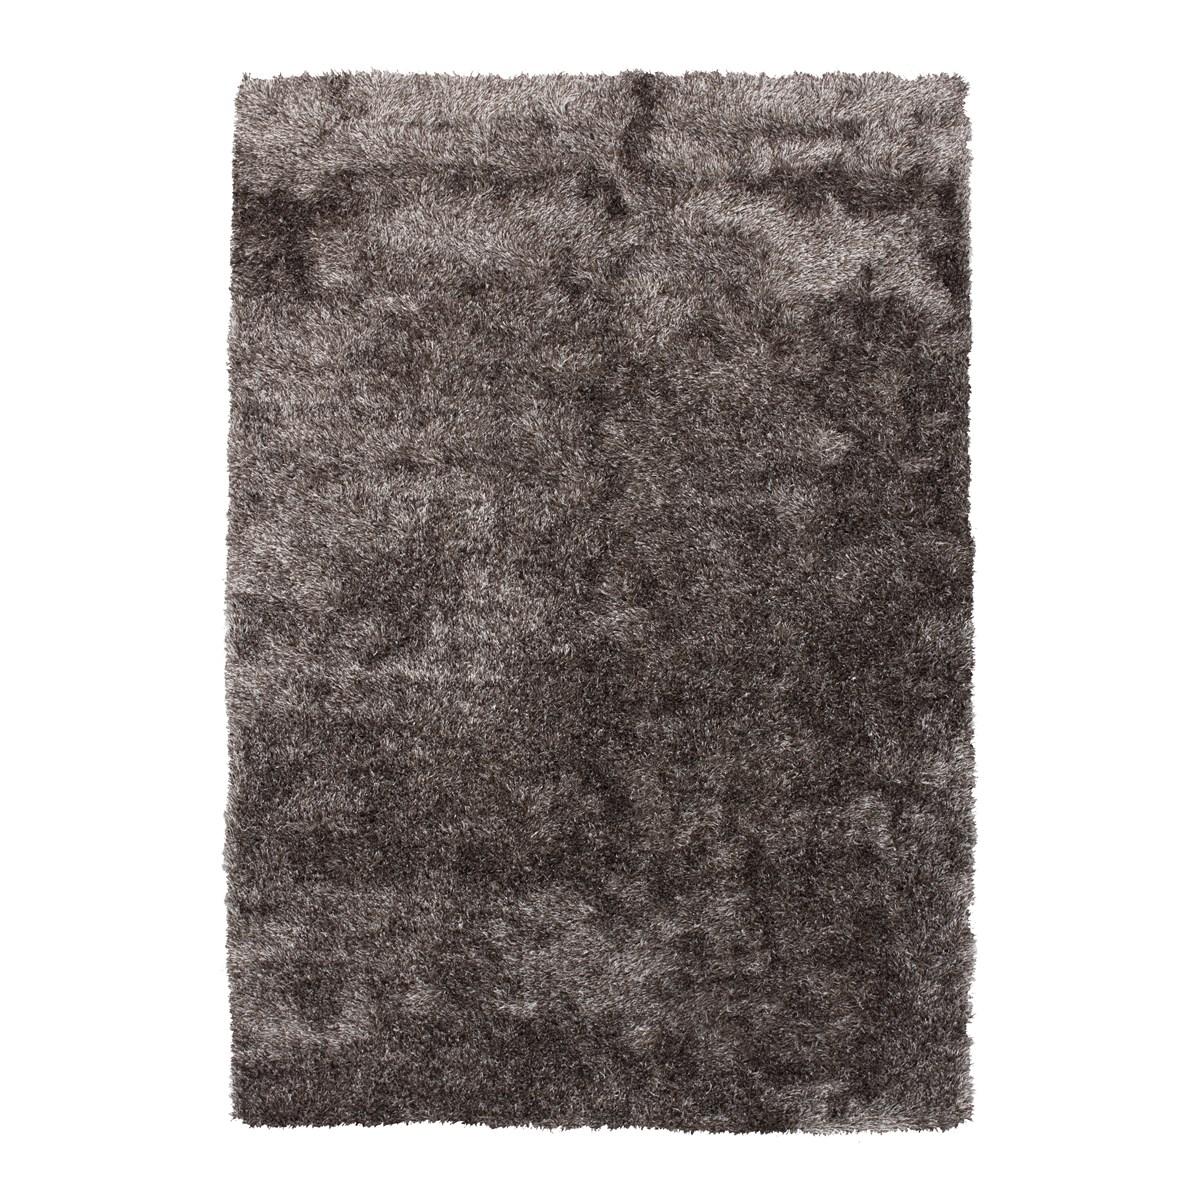 Tapis shaggy en Polyester Gris anthracite 80x150 cm